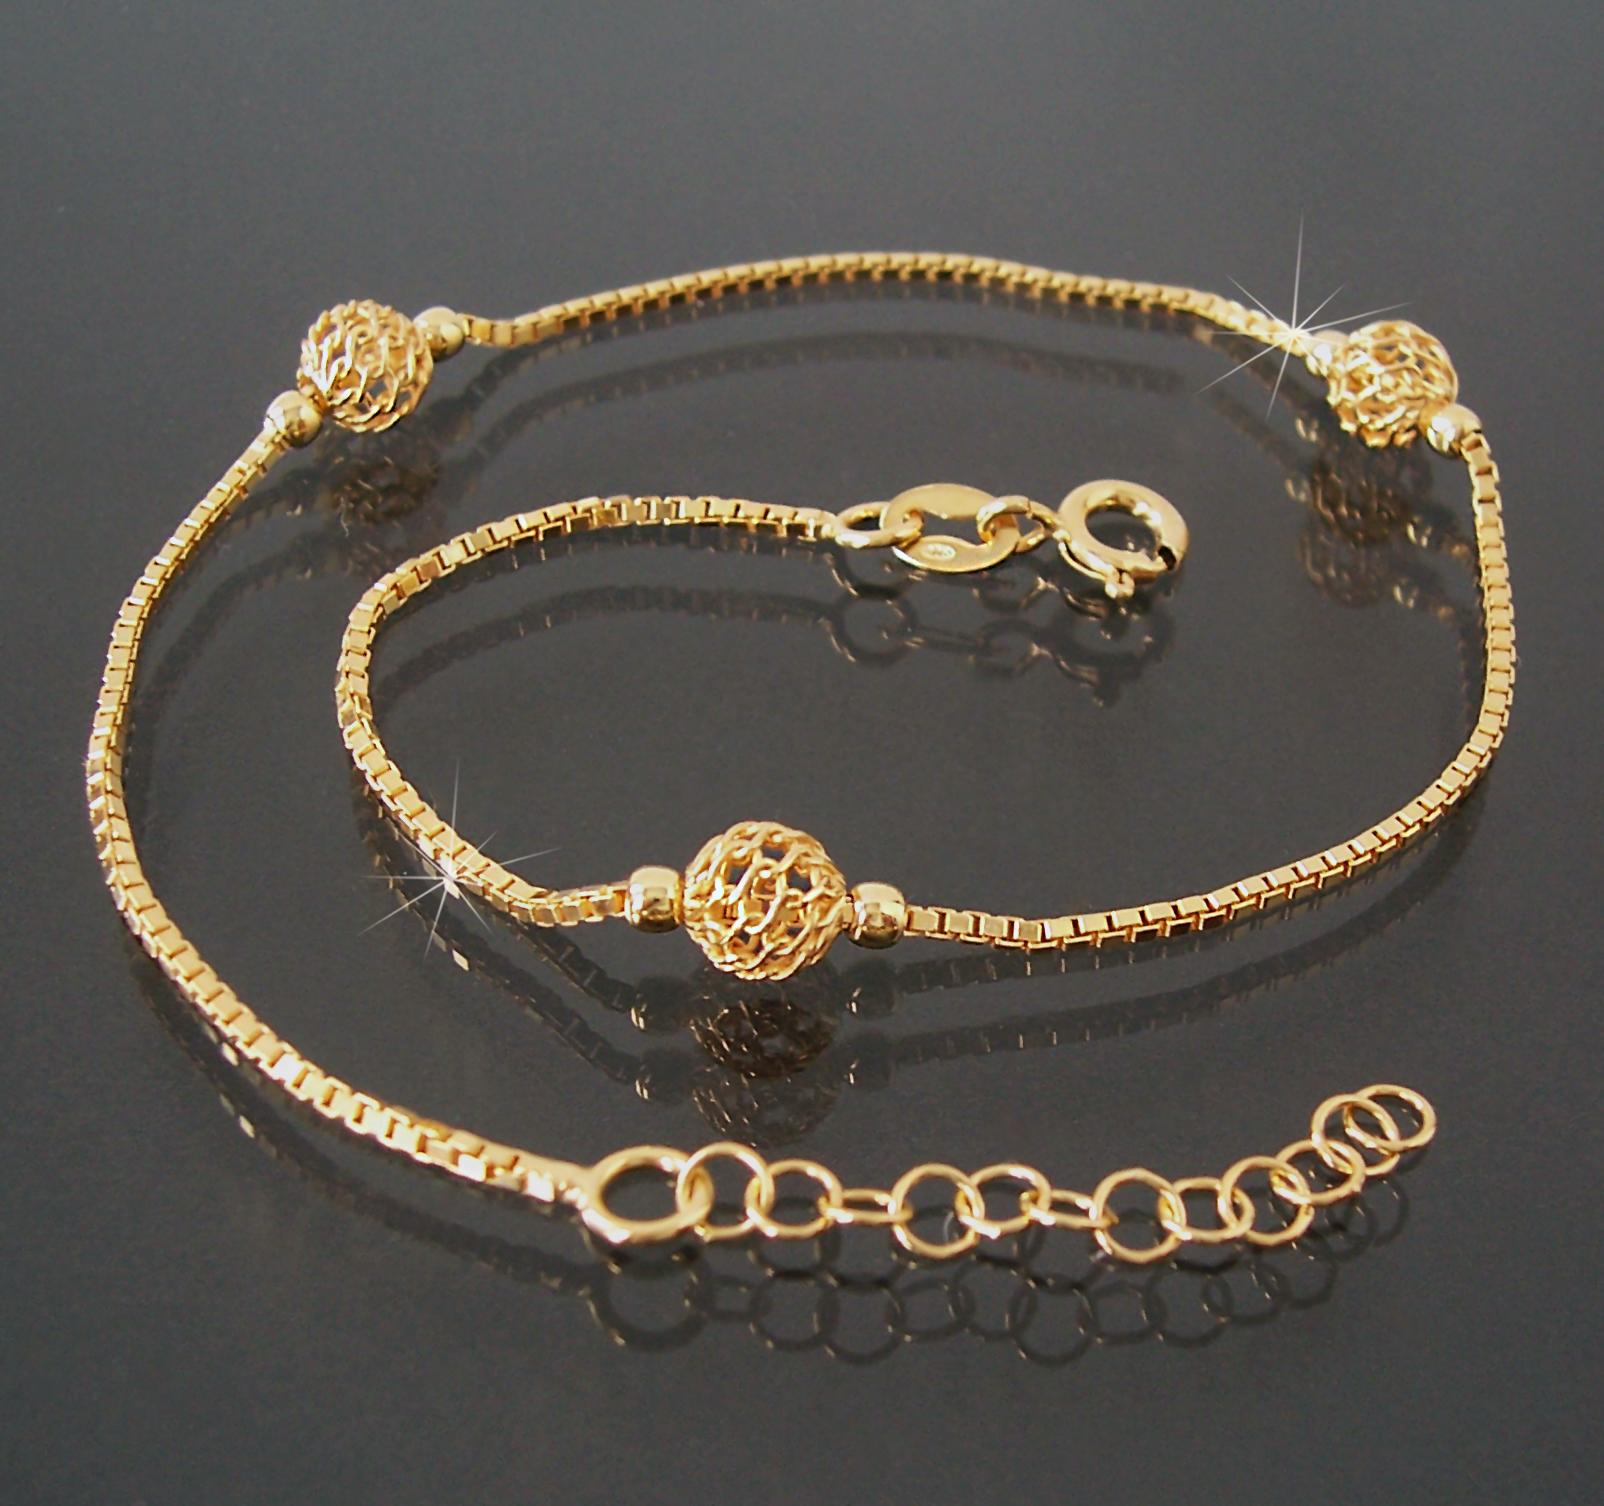 Fußkette Gold 1,8mm Veneziakette 925 Silber 24-27cm Perlen 14618G-27